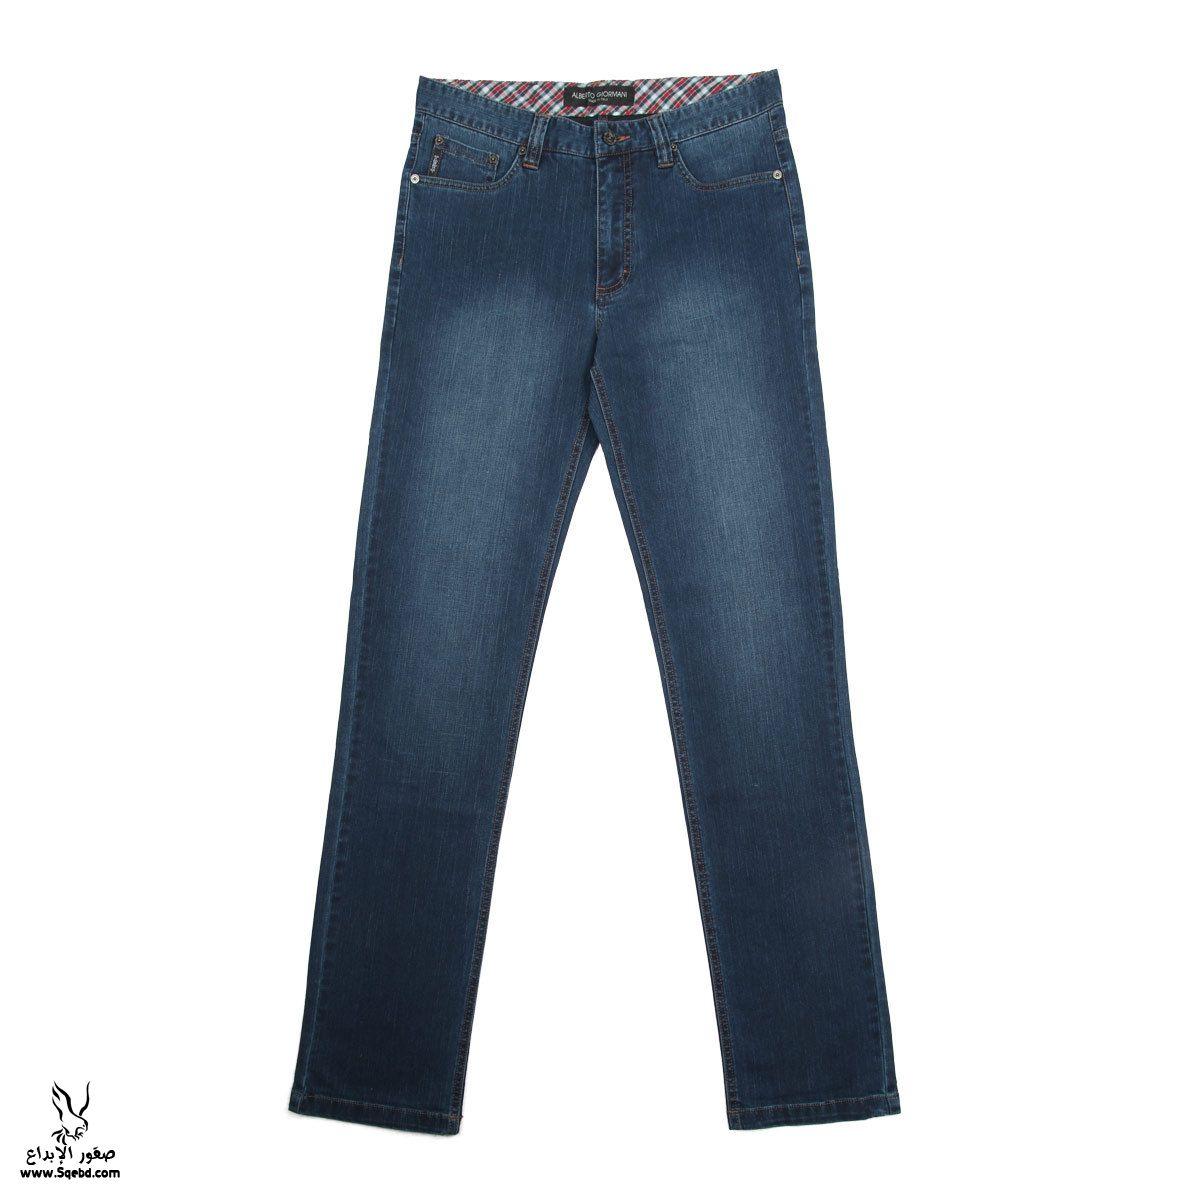 Trousers Jeans Men 2016 , ������ ����  , ������ ���� ����� 2013_1383470284_423.